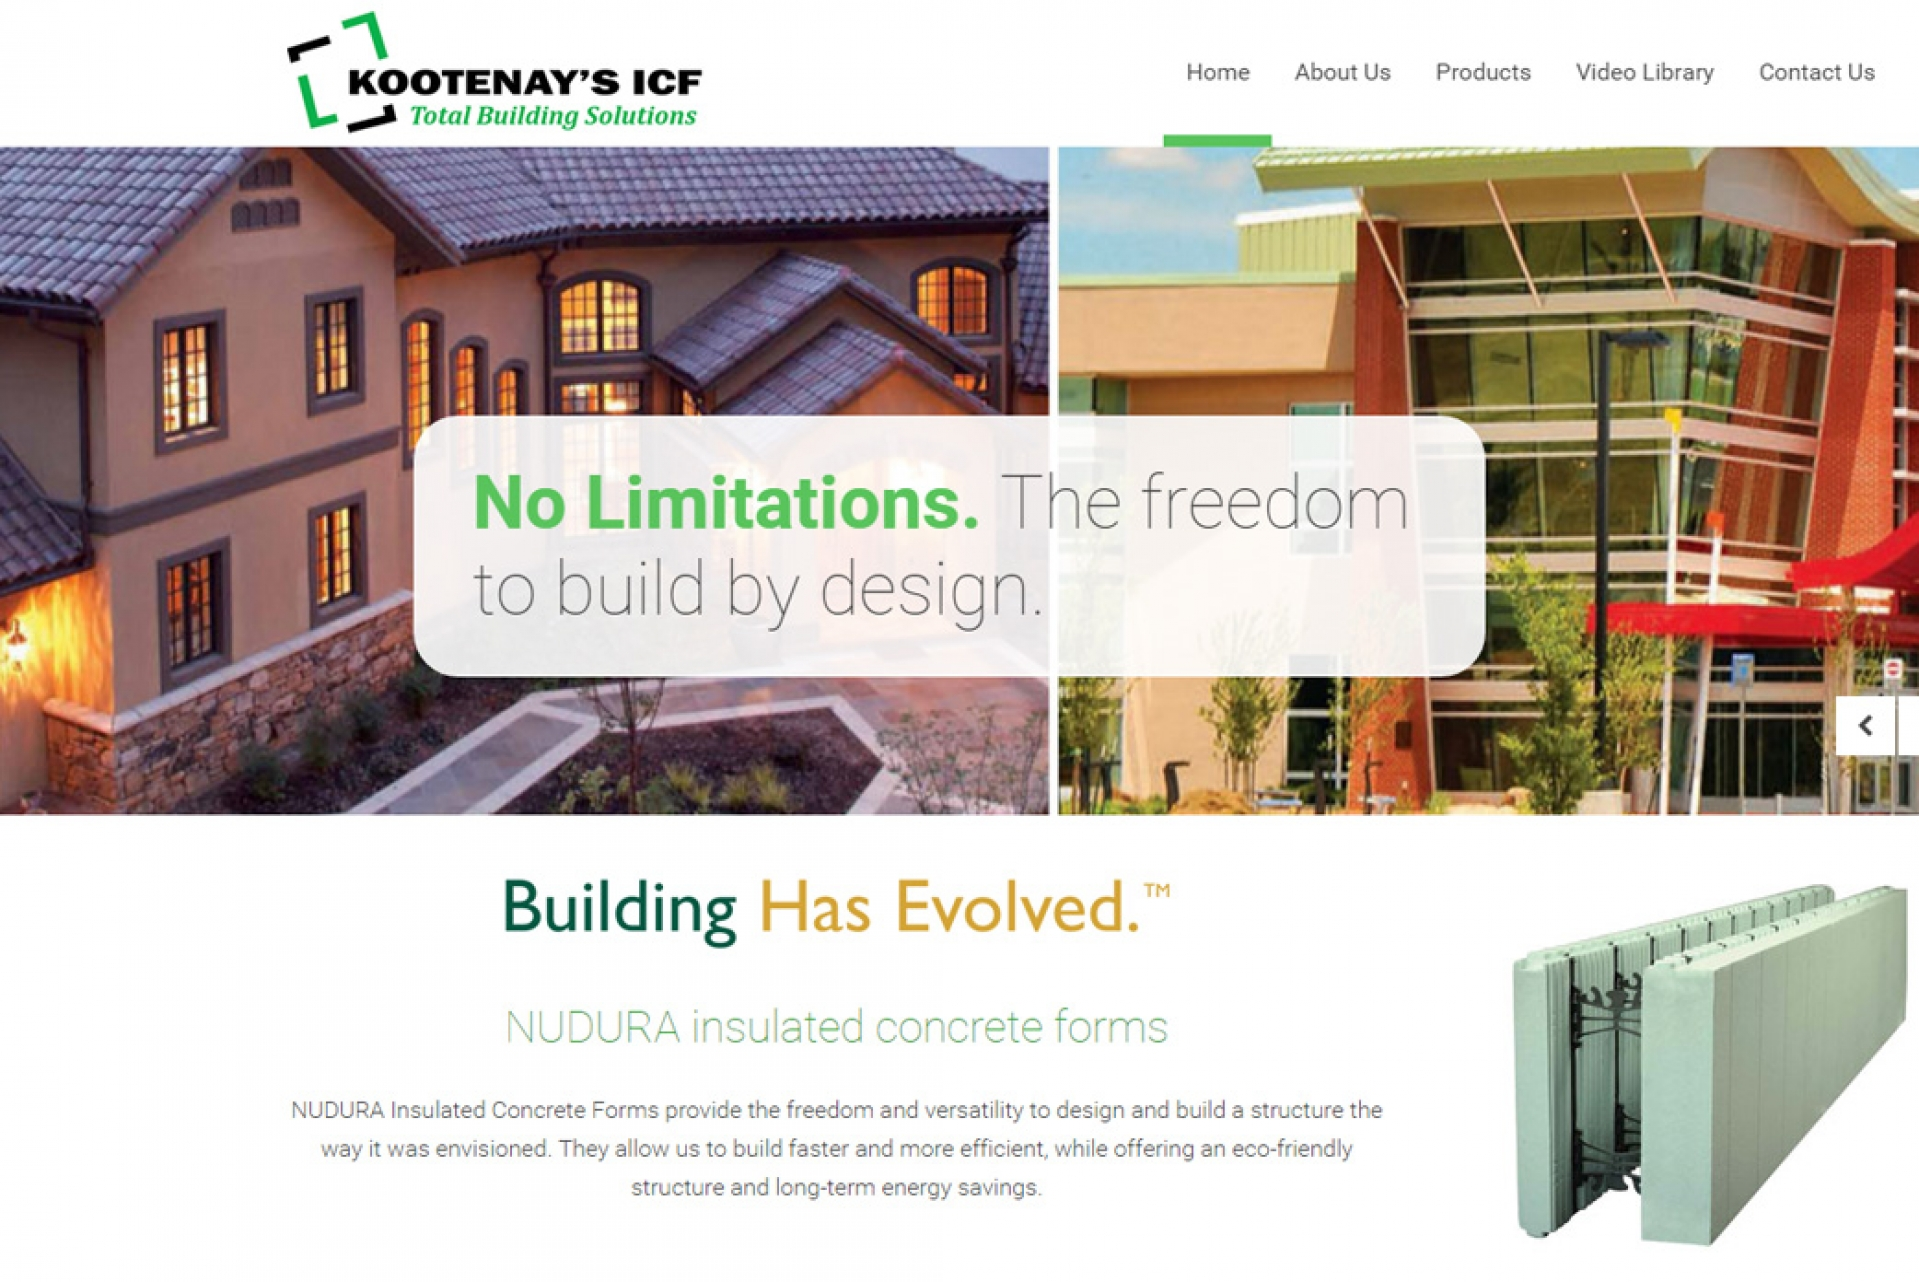 Kootenay's ICFS